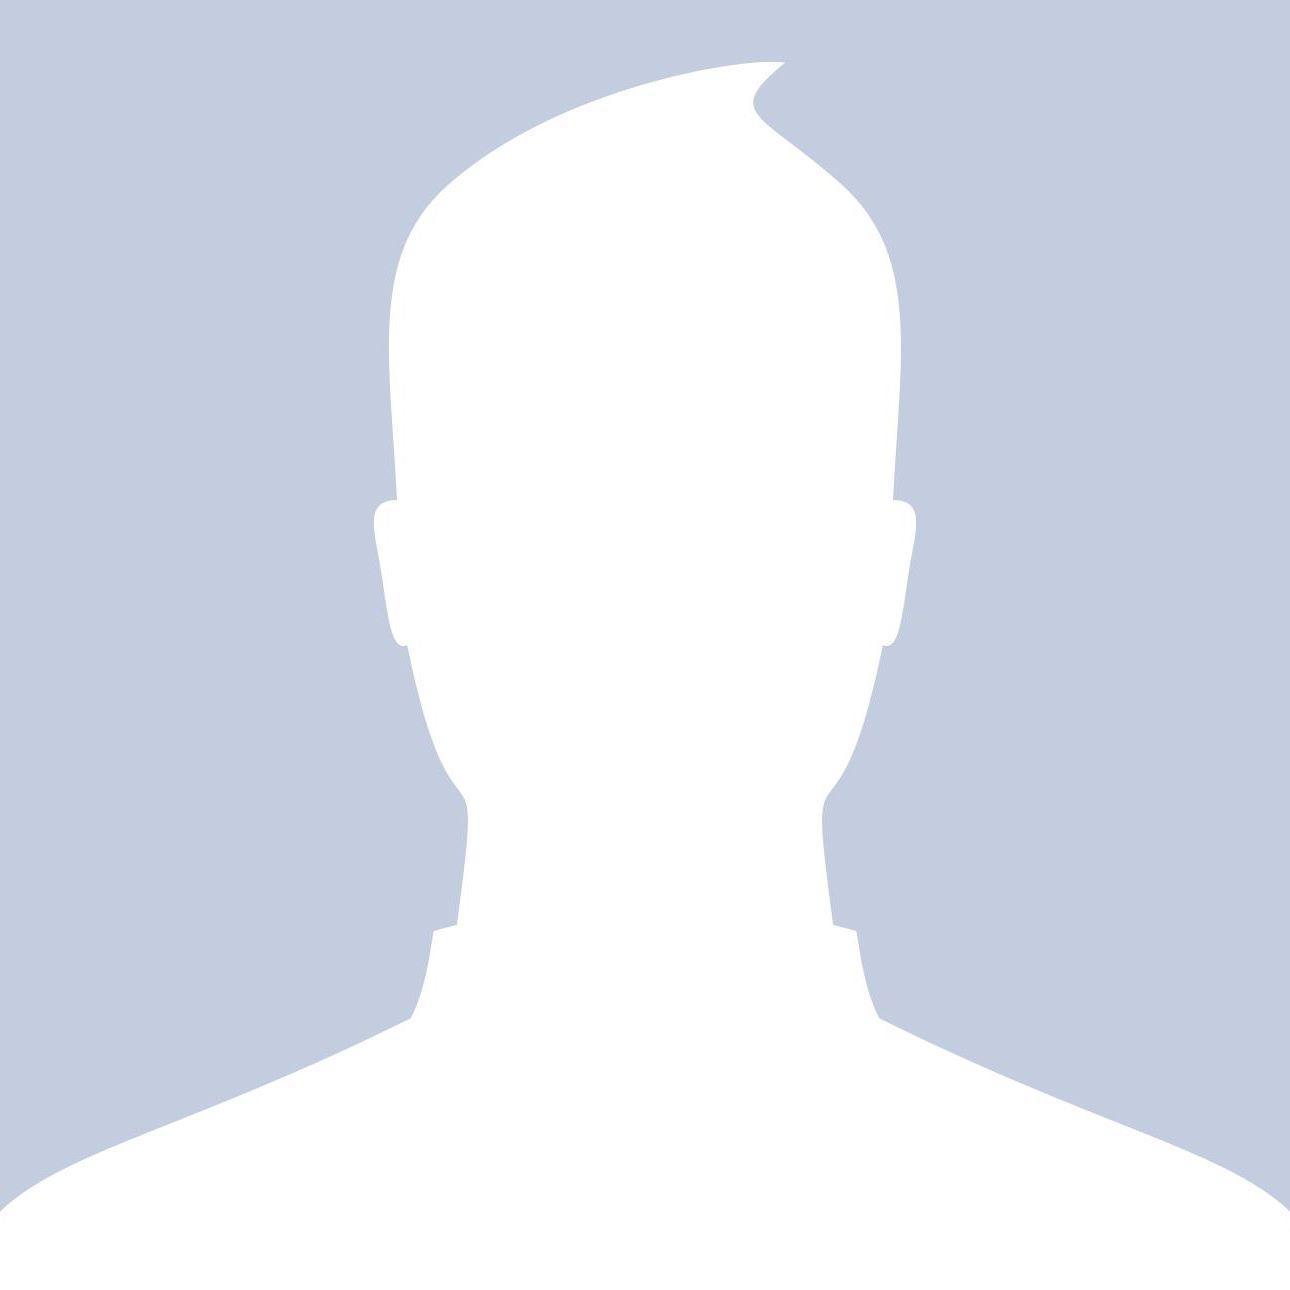 profilbild.png